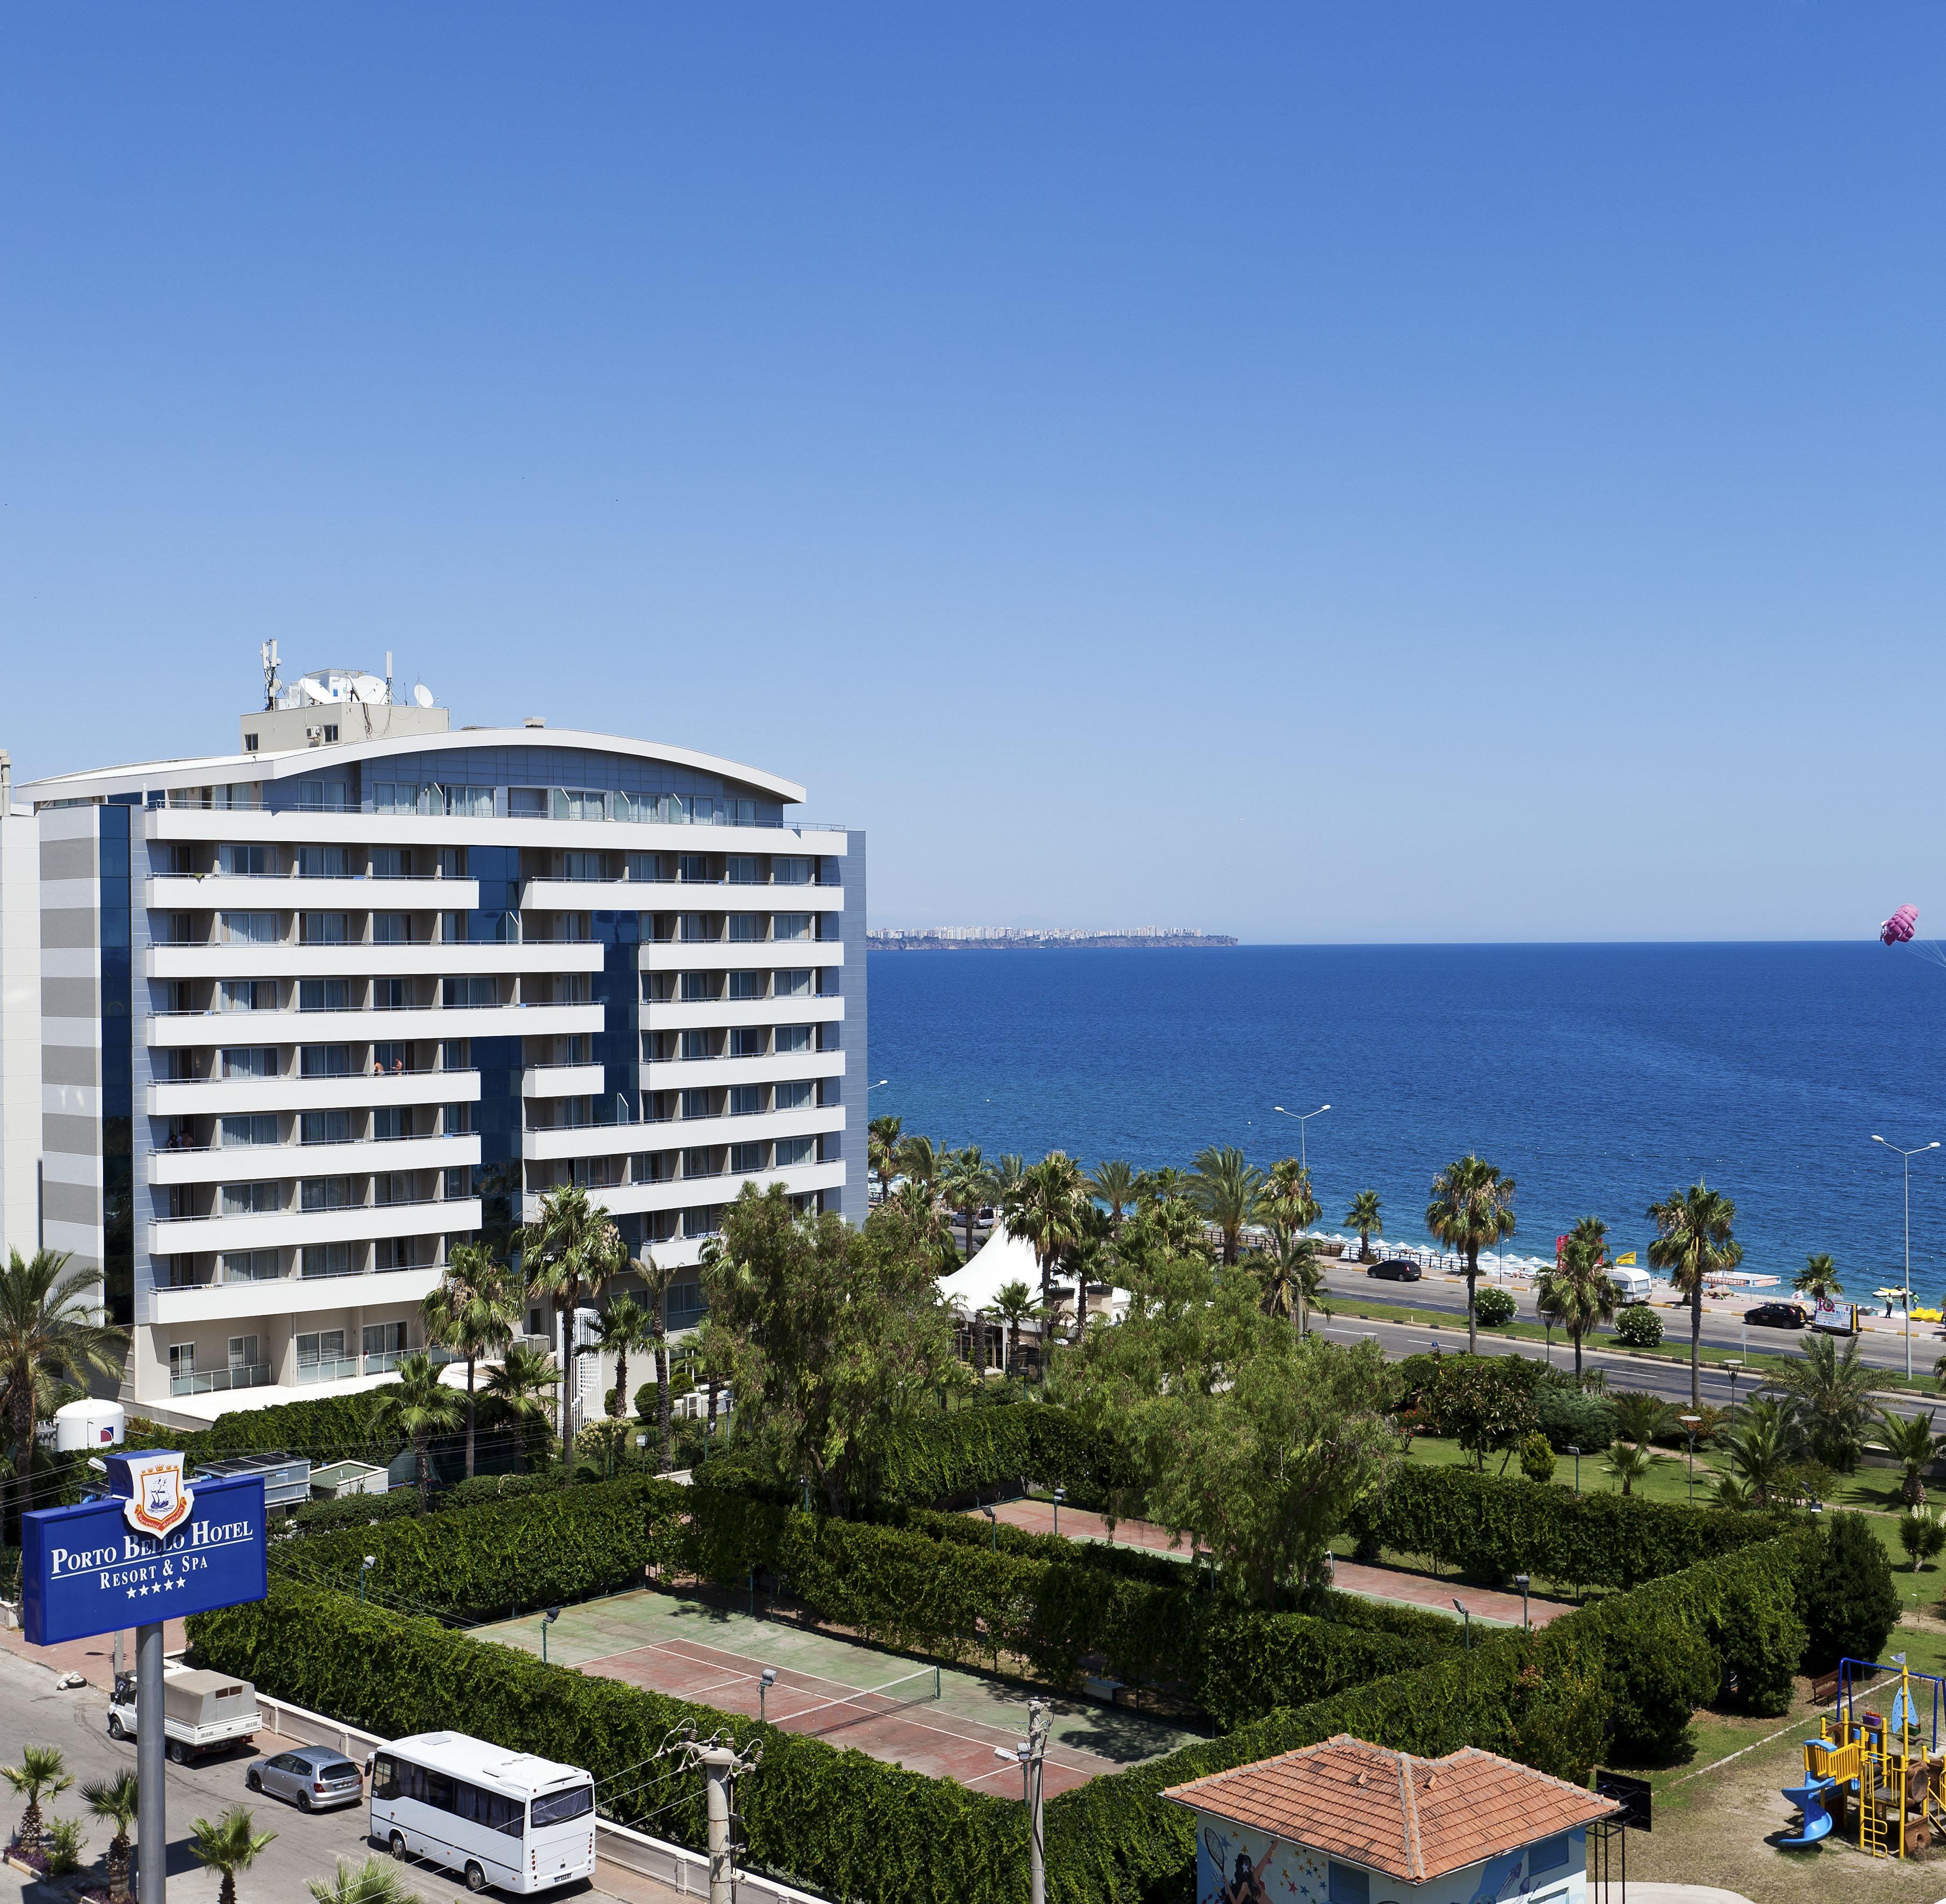 Porto bello hotel antalya 5 sterne hotel for Hotelsuche familienzimmer